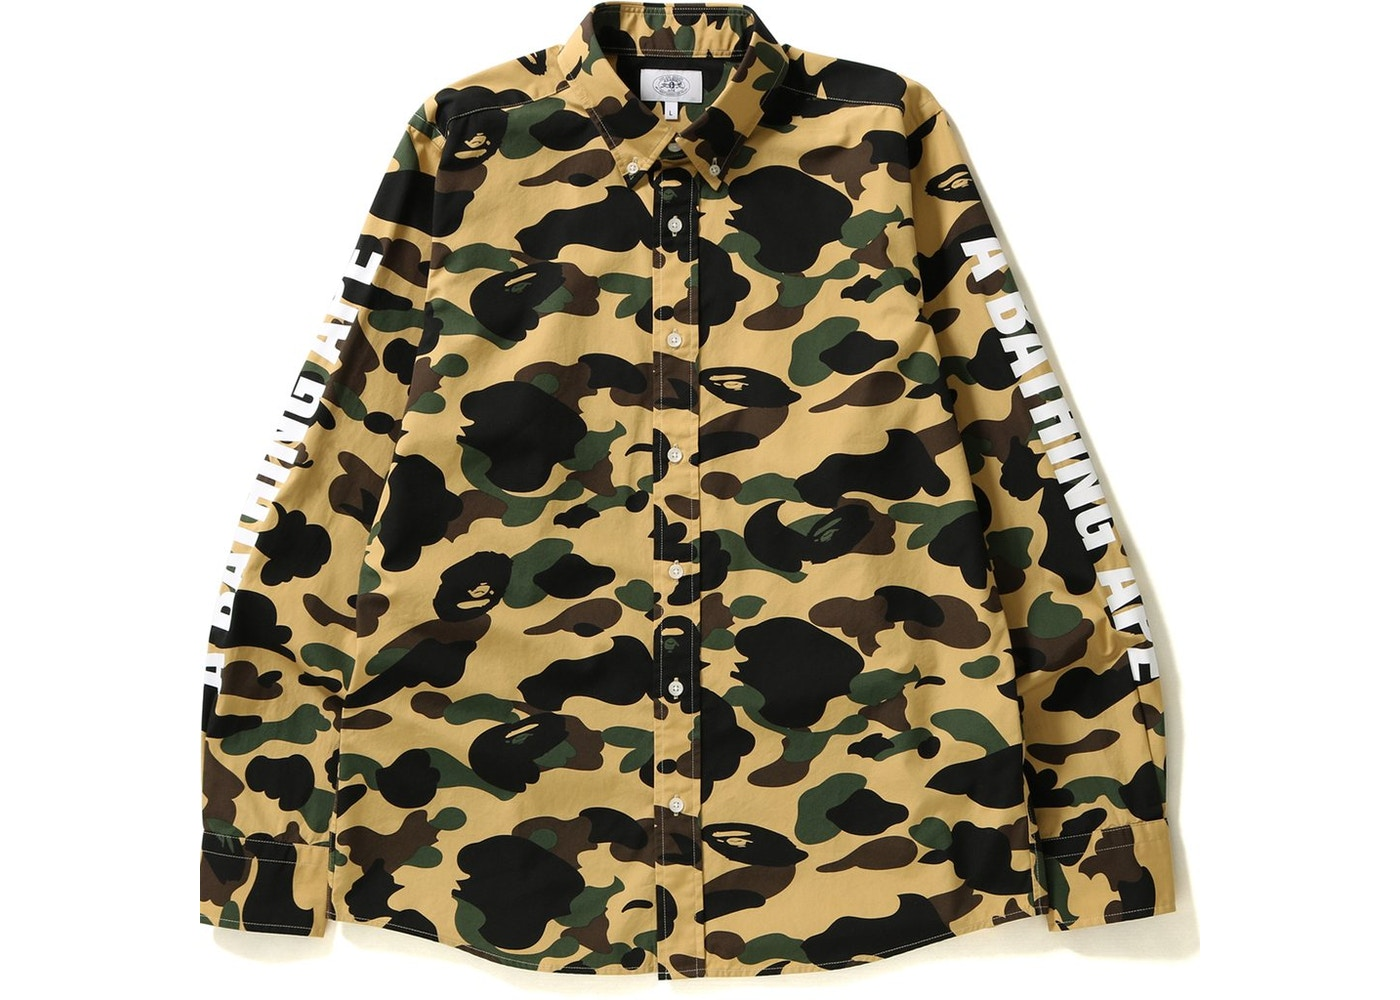 d345bd1c Streetwear - Bape Shirts - Most Popular